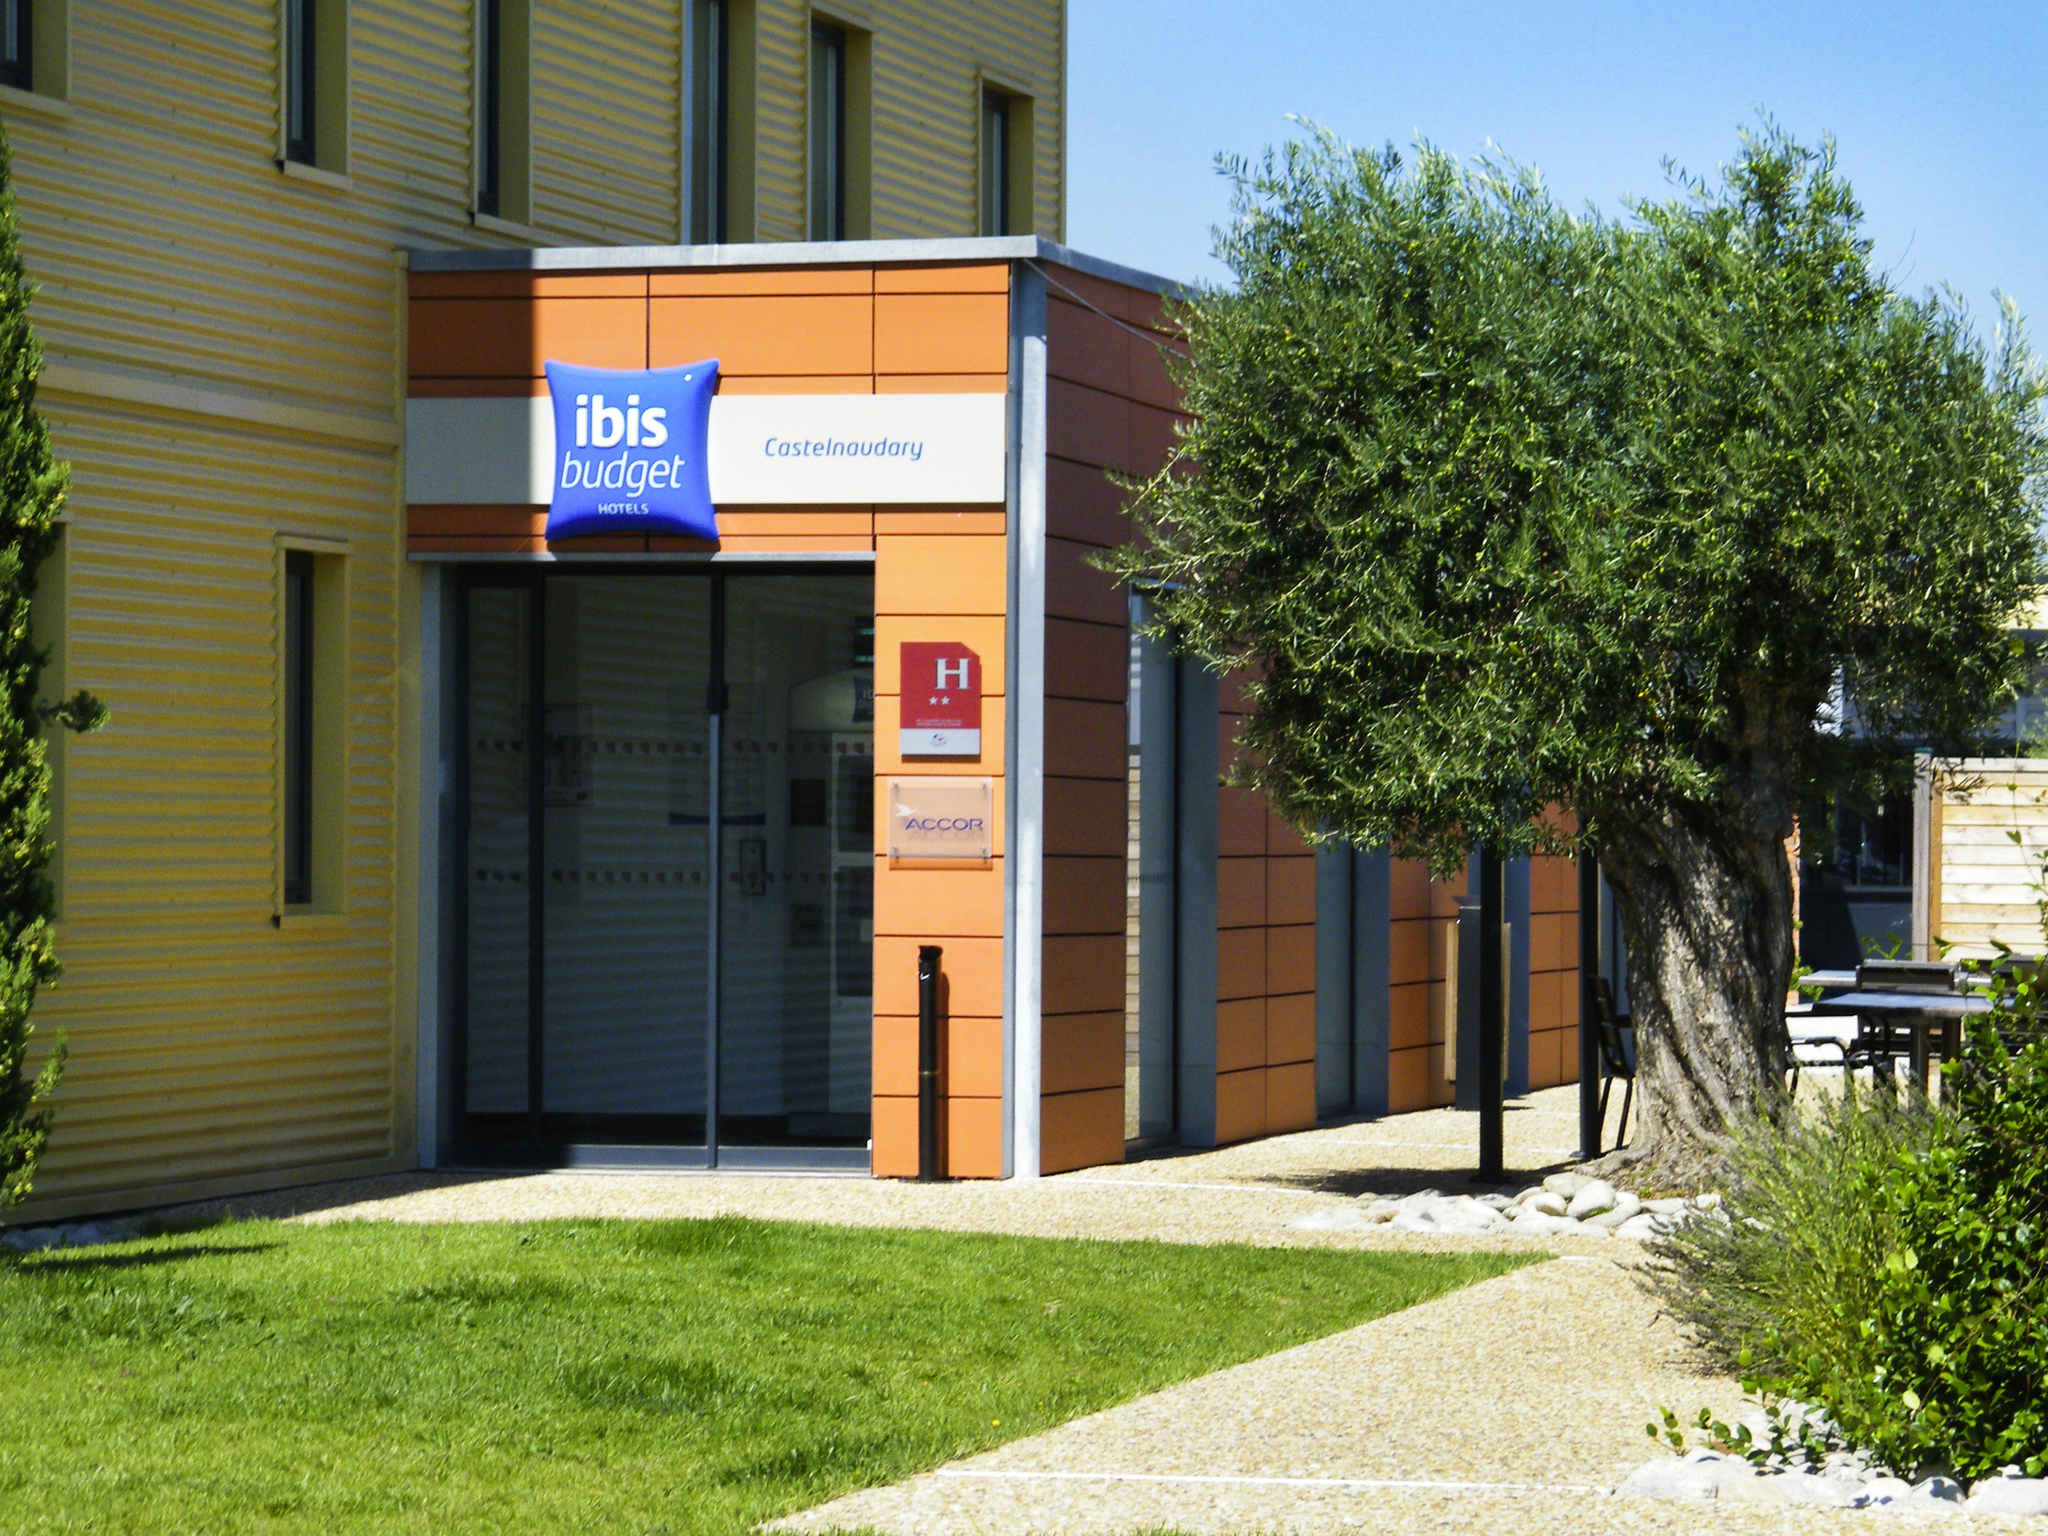 Hôtel - ibis budget Castelnaudary